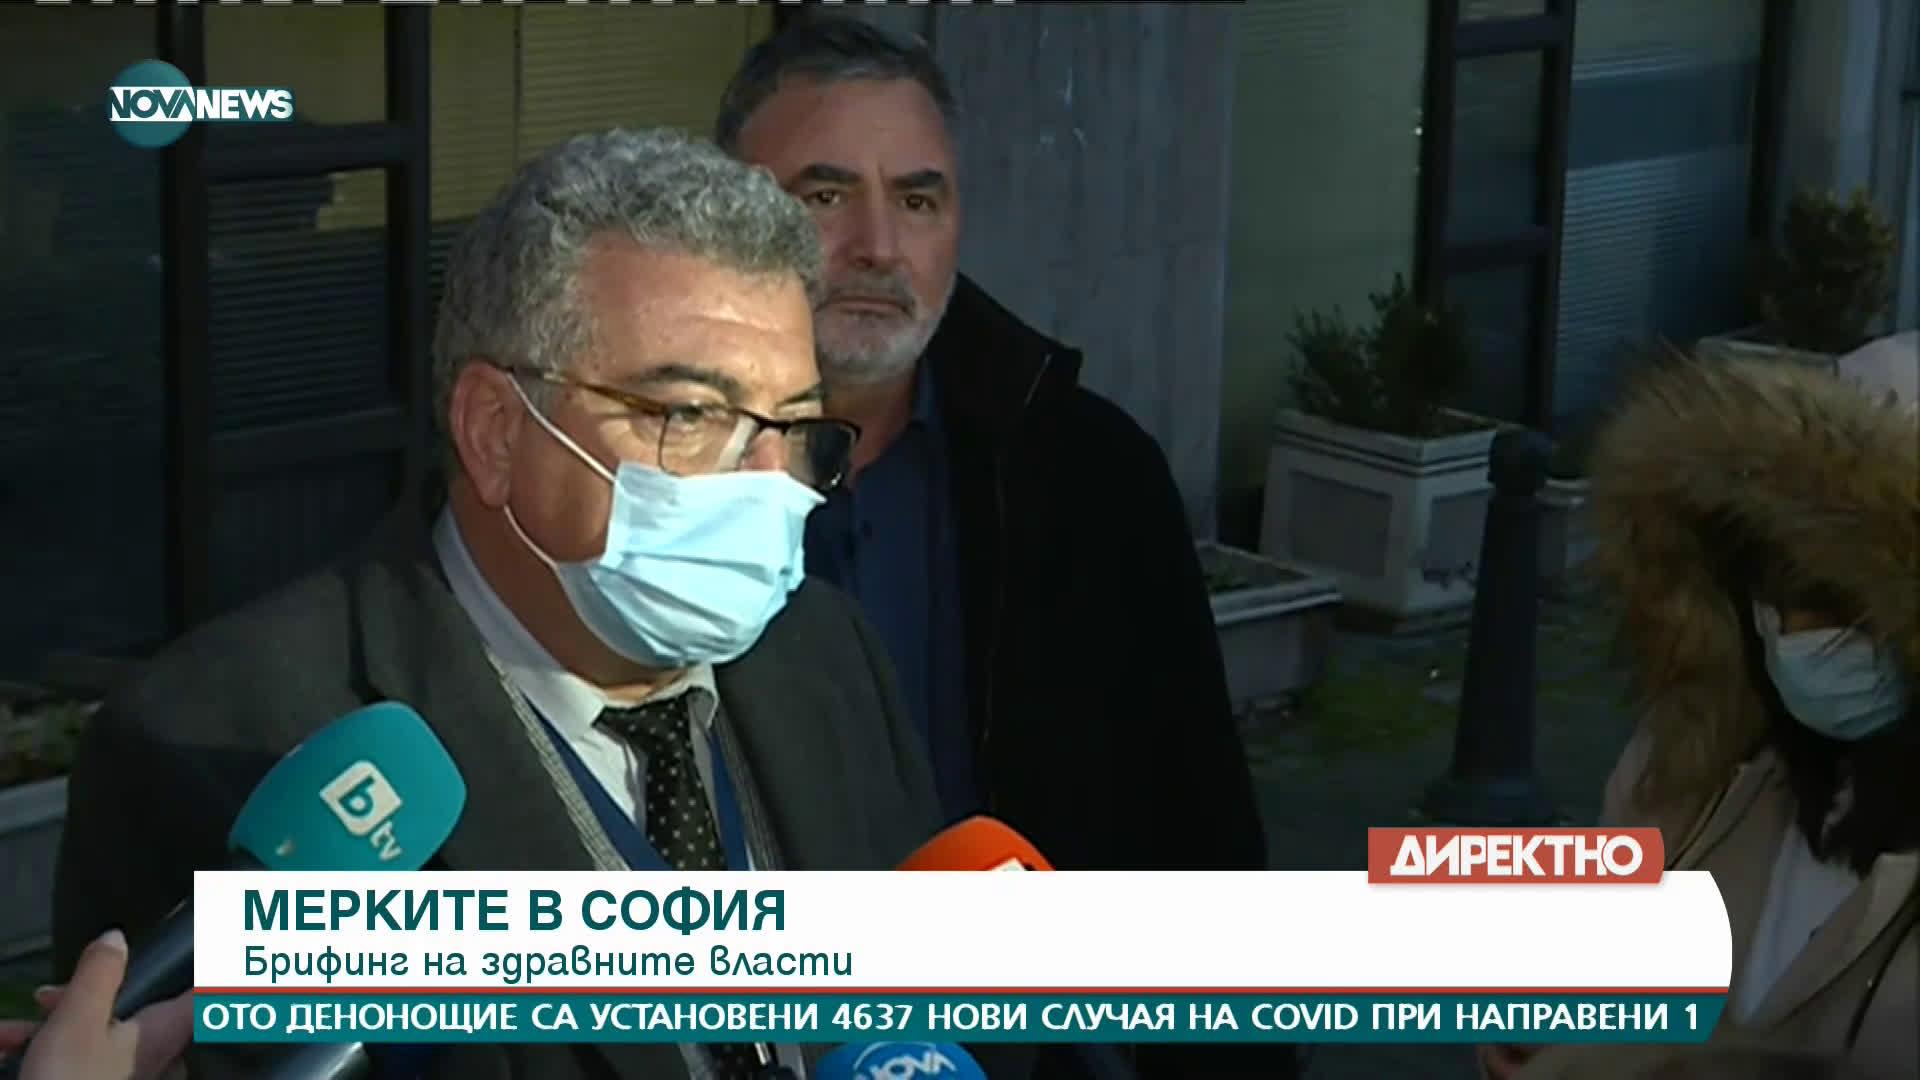 Кунчев: Сега е моментът за национално решение за затваряне